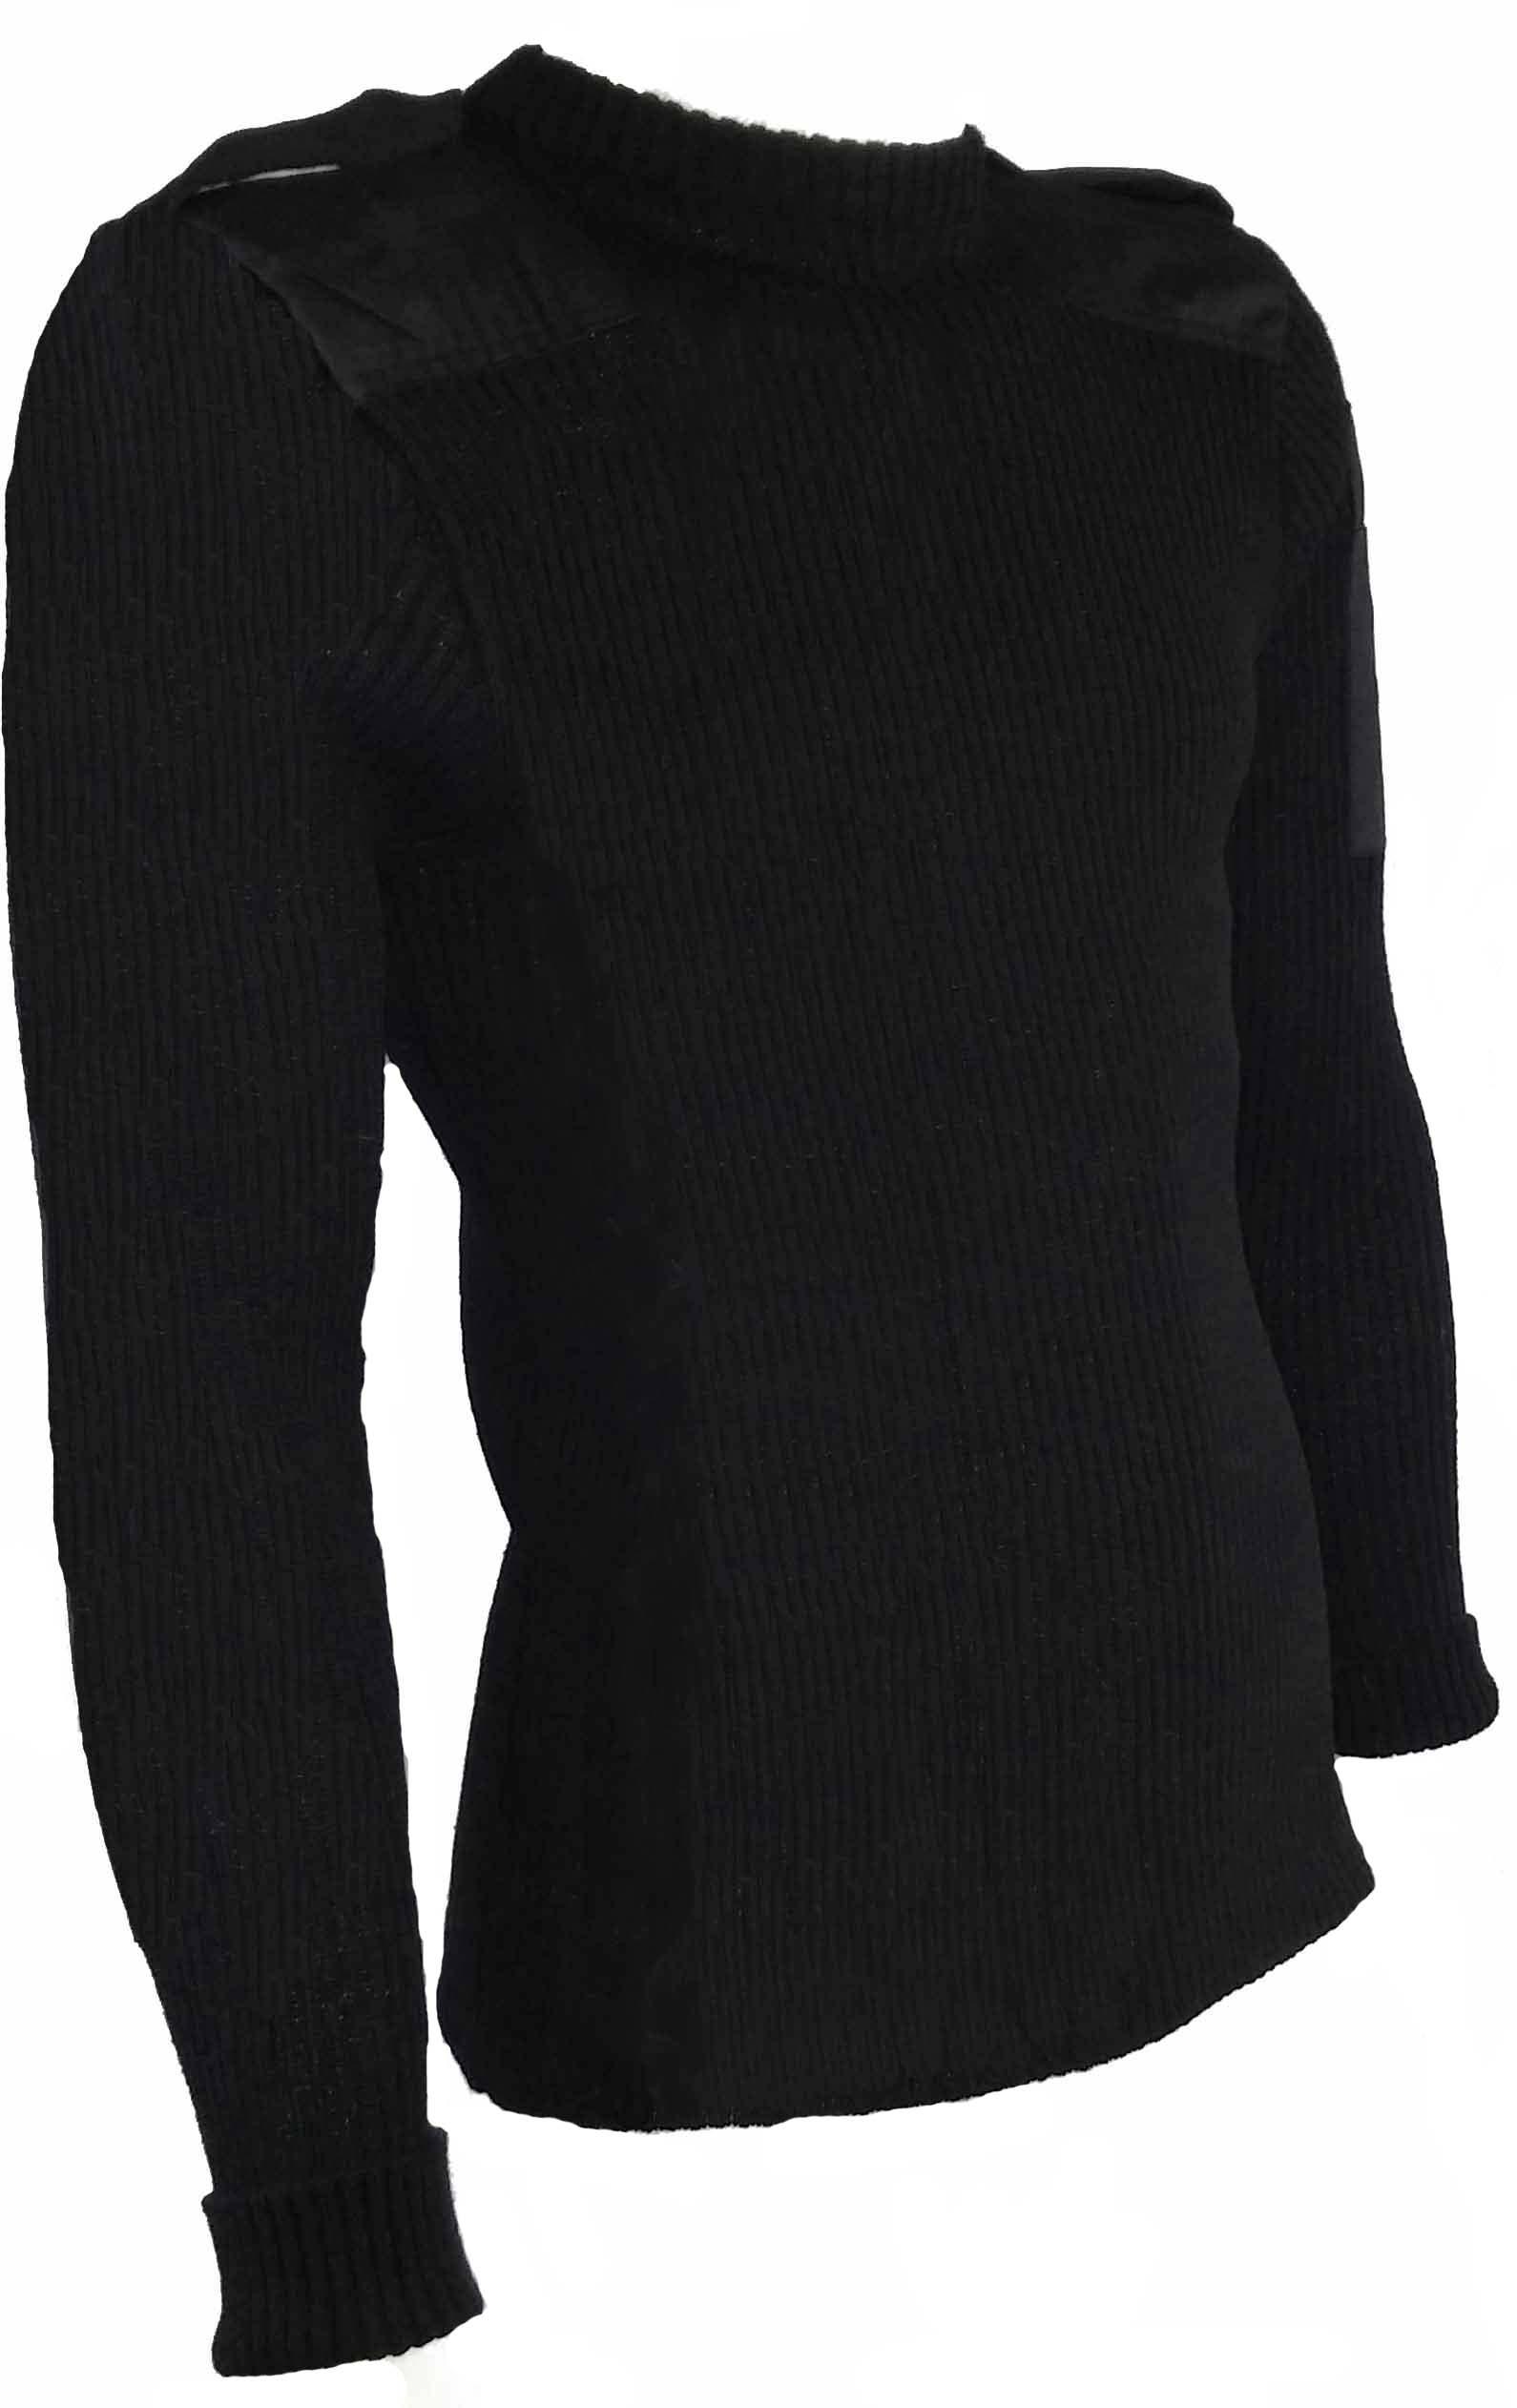 SGS wool black sweather